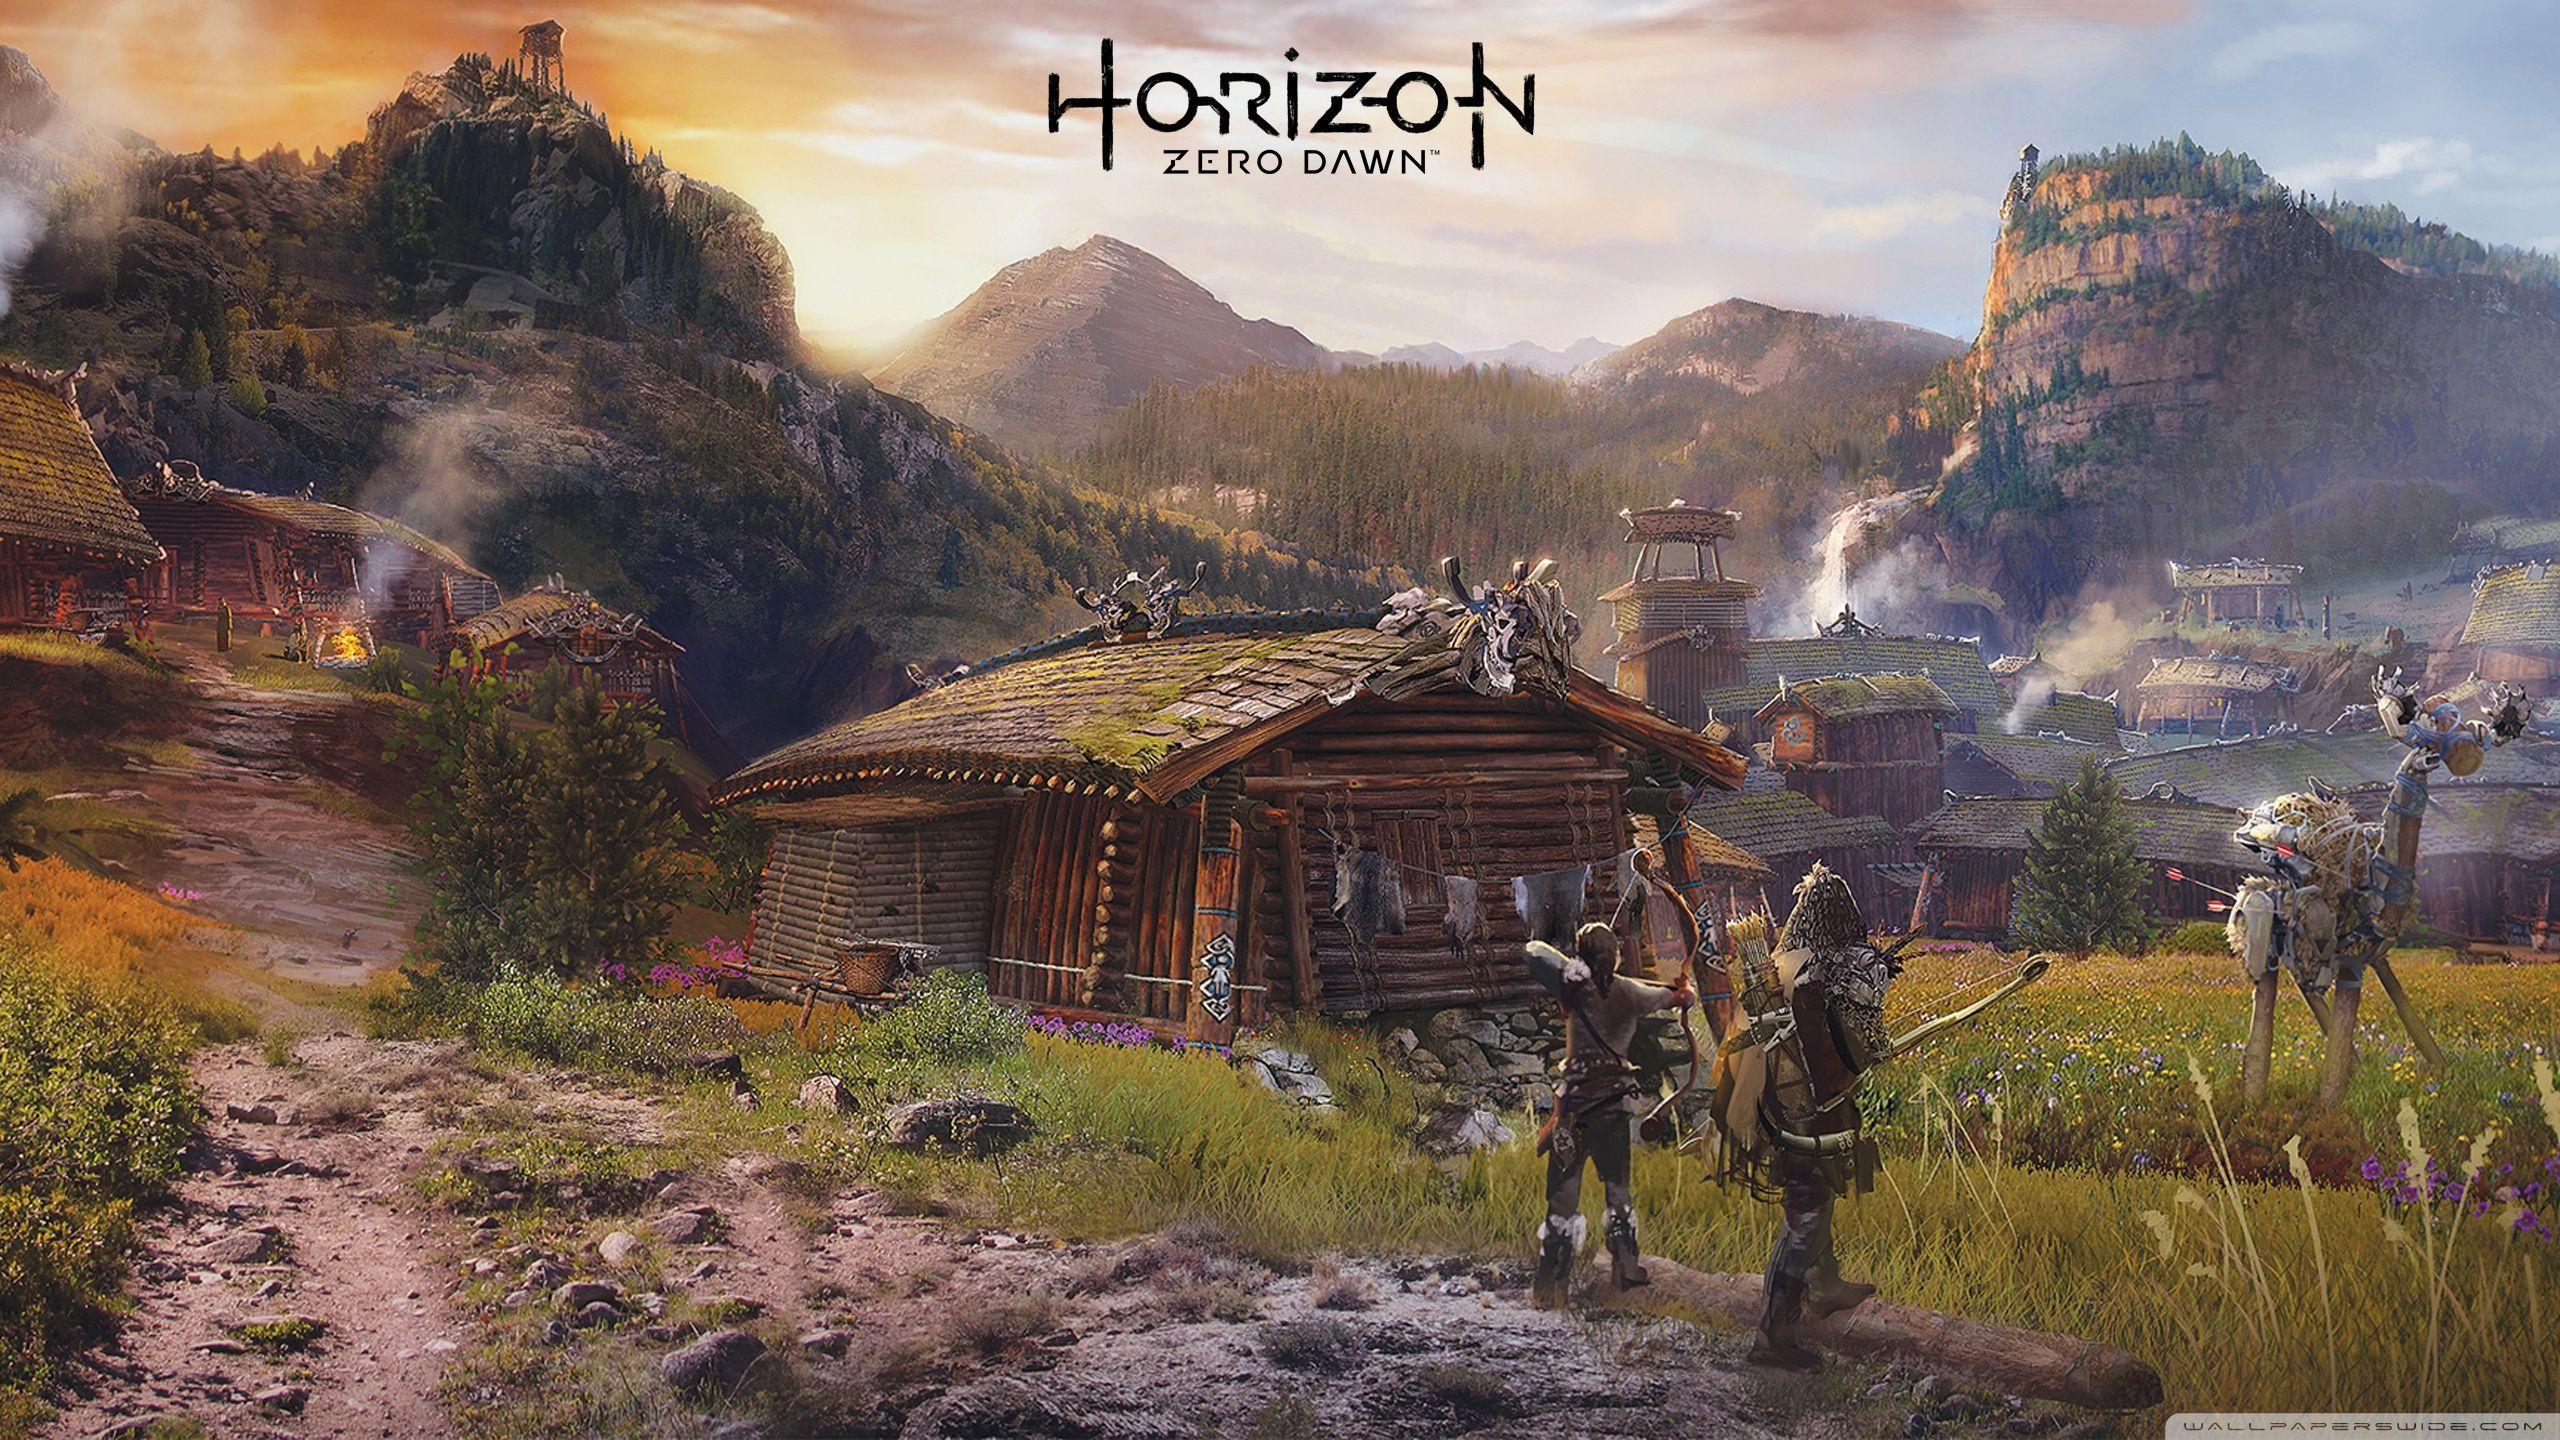 Horizon Zero Dawn 1440p Wallpapers Top Free Horizon Zero Dawn